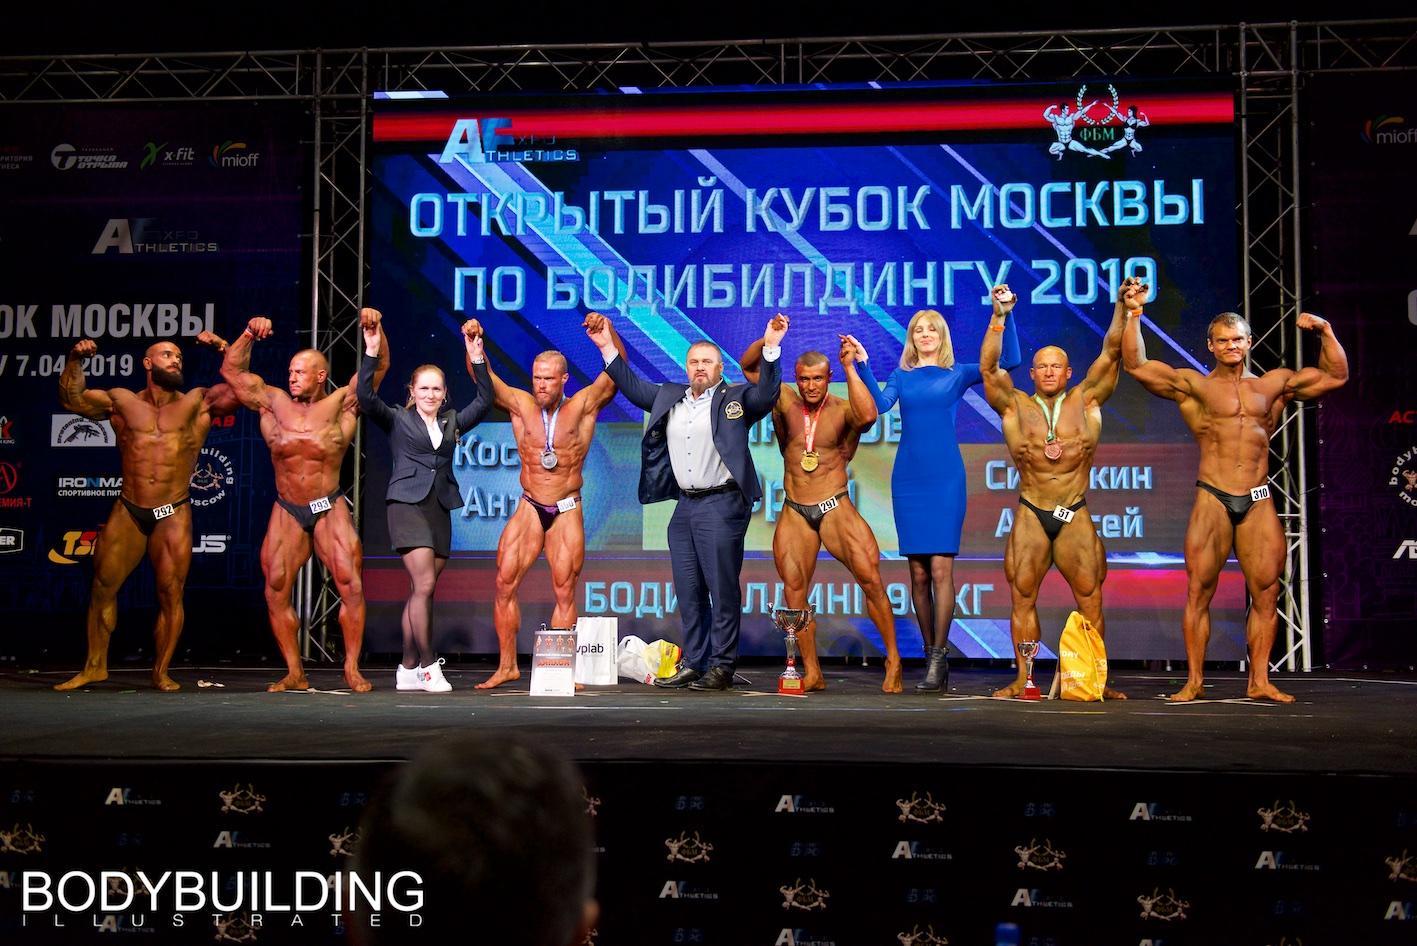 Кубок Москвы по бодибилдингу 2019 Категория:  бодибилдинг